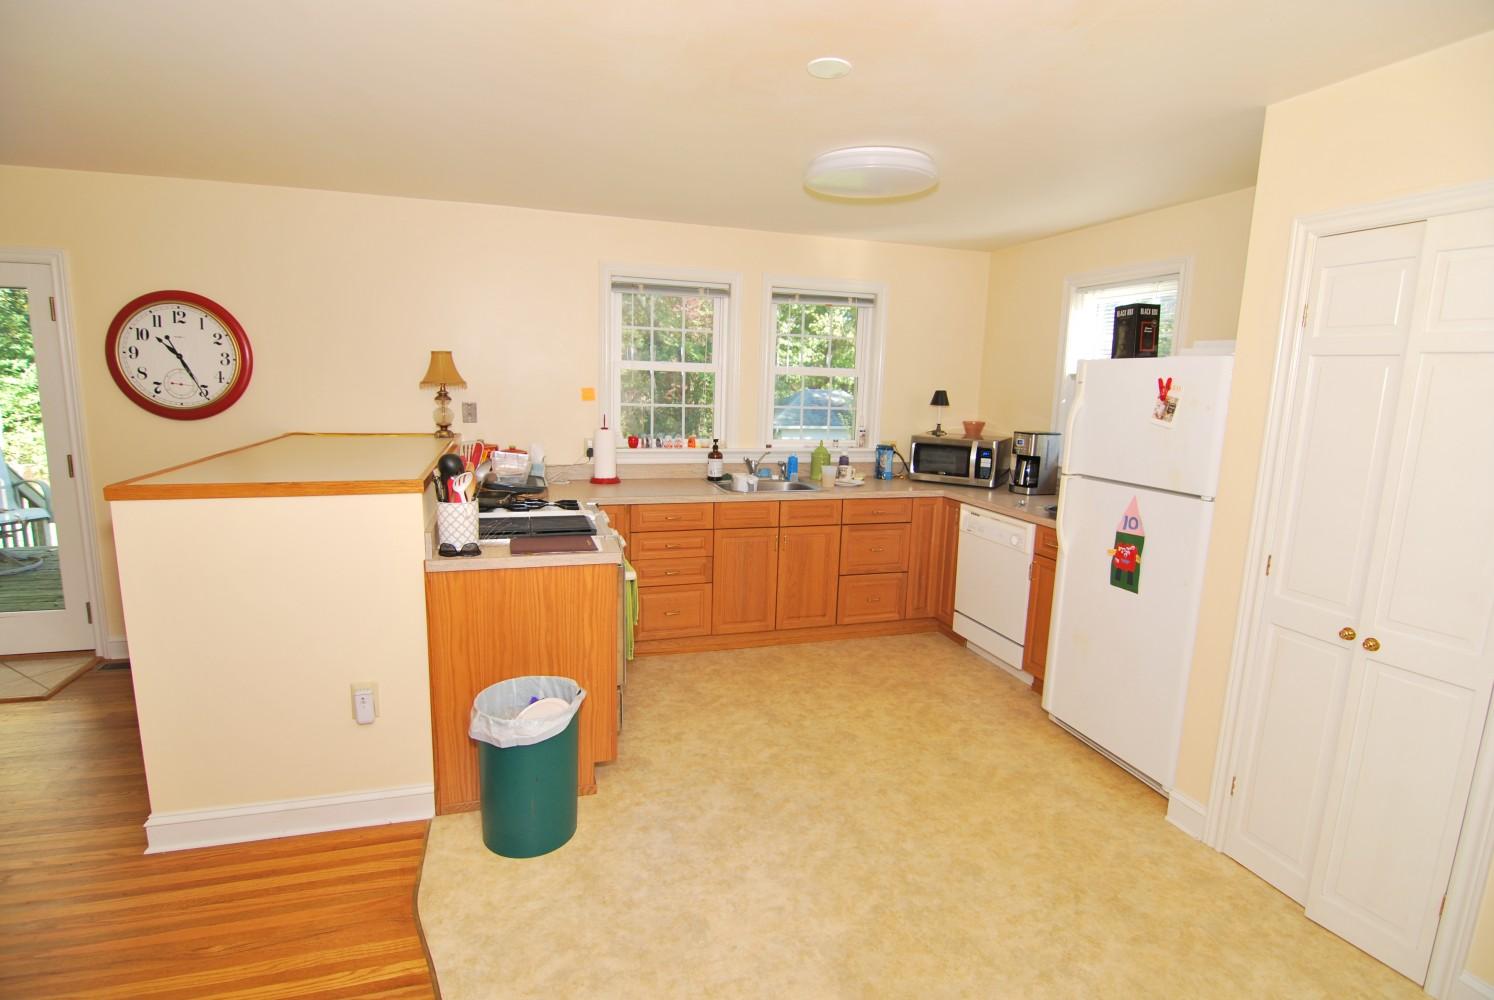 Navy white kitchen marlton nj distinctive interior for Distinctive interior designs